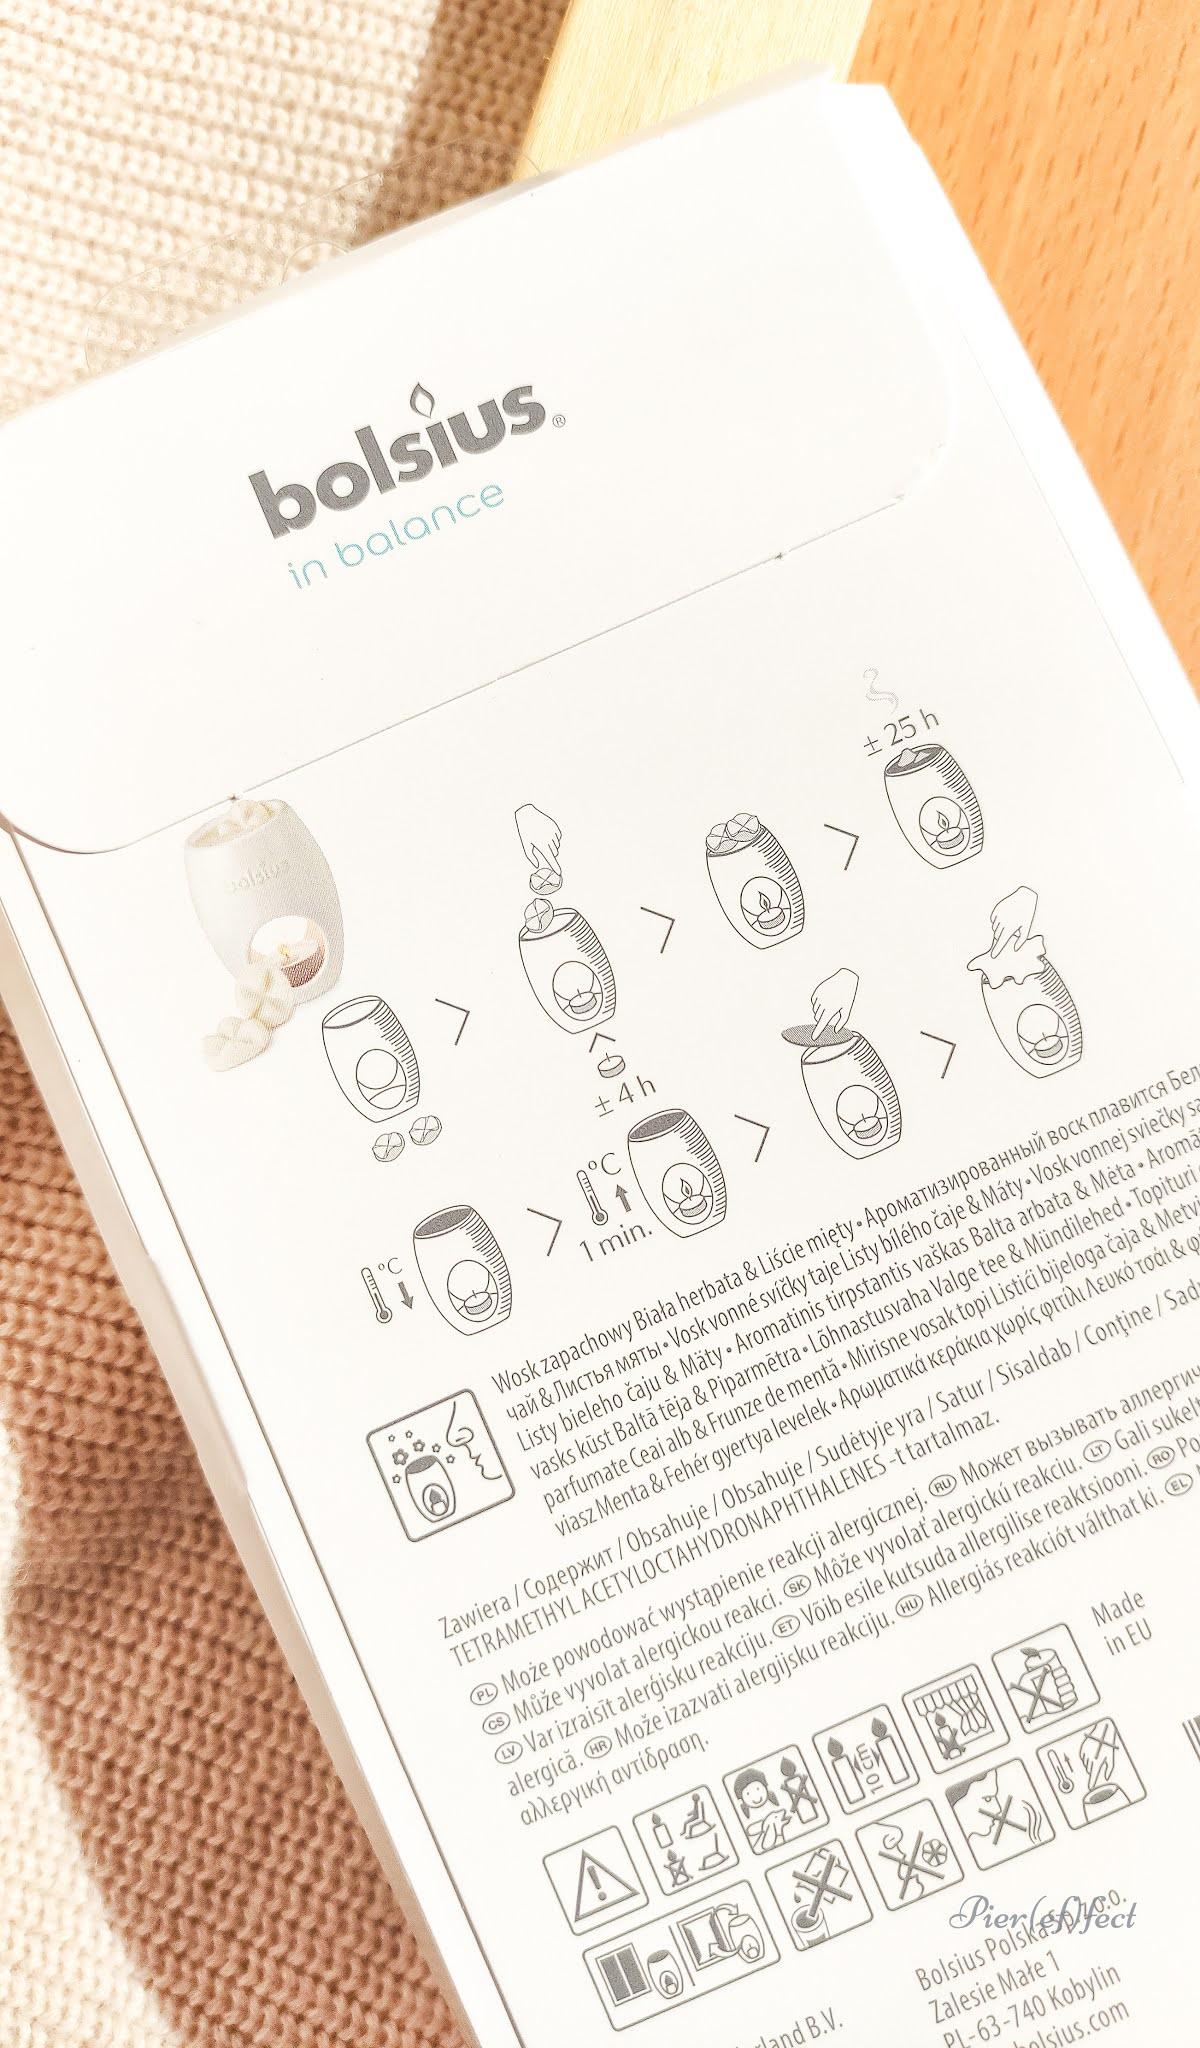 bolsius wax melts